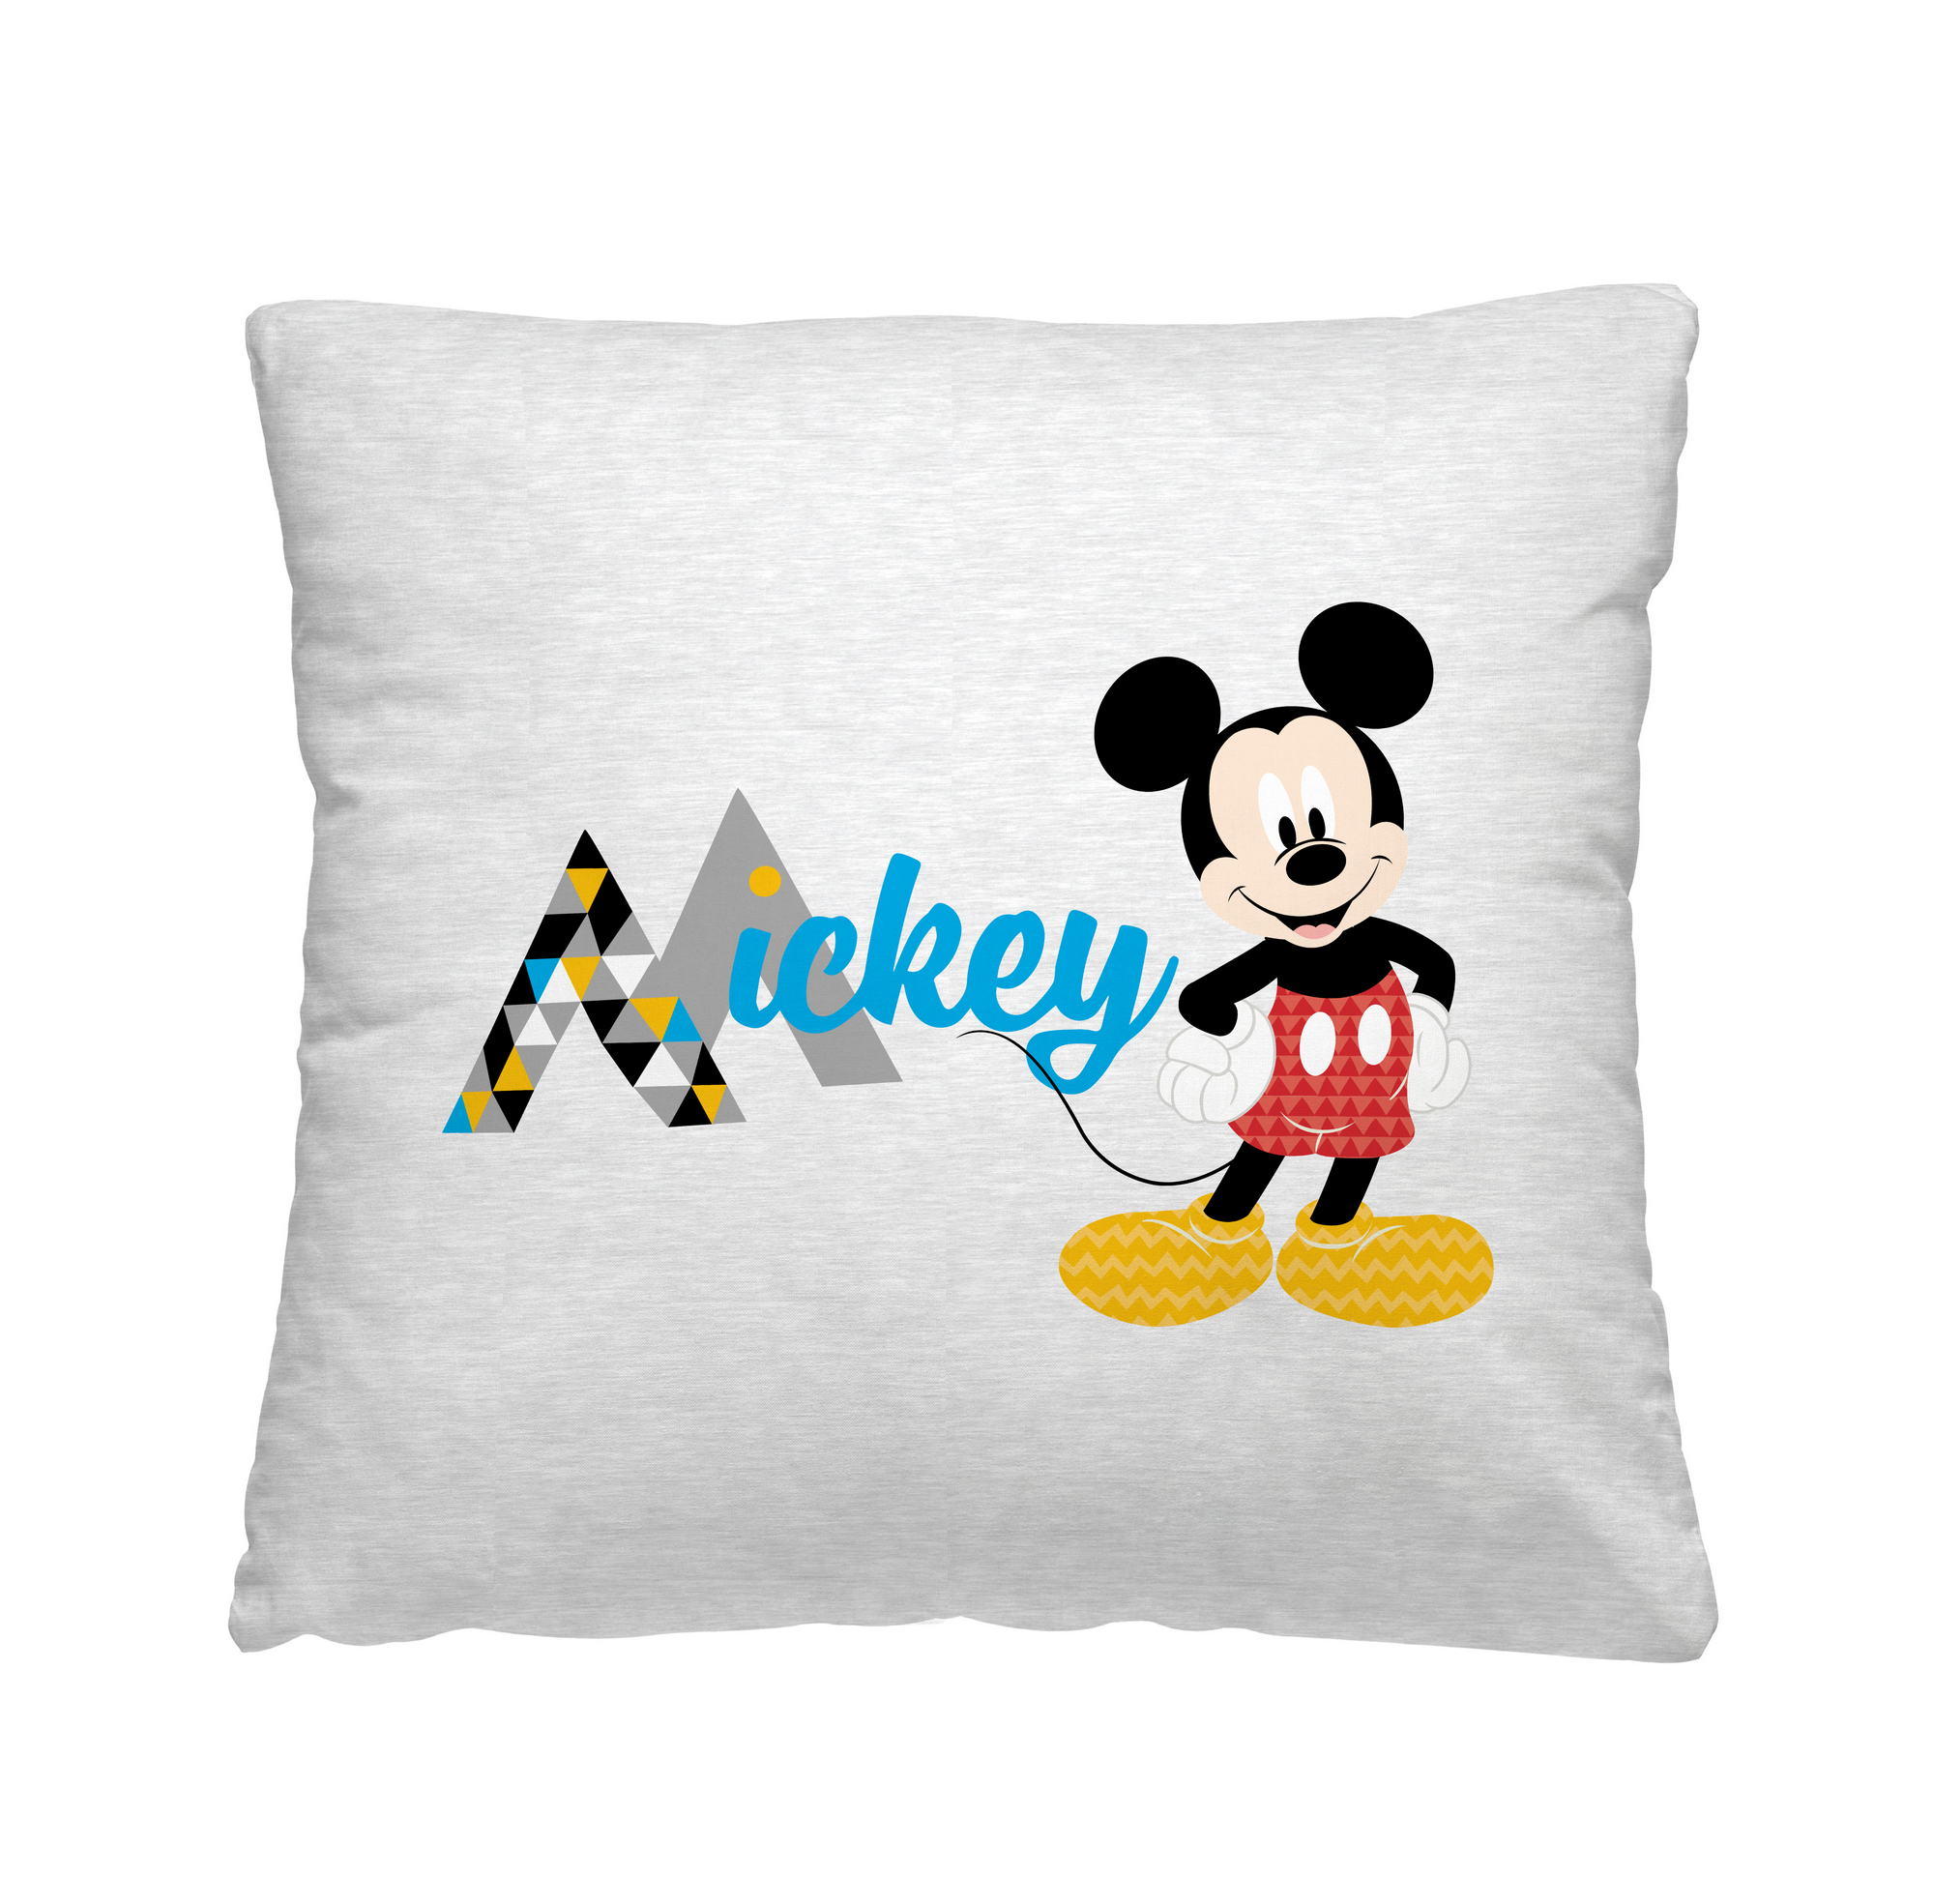 Декоративные подушки Disney disn632105